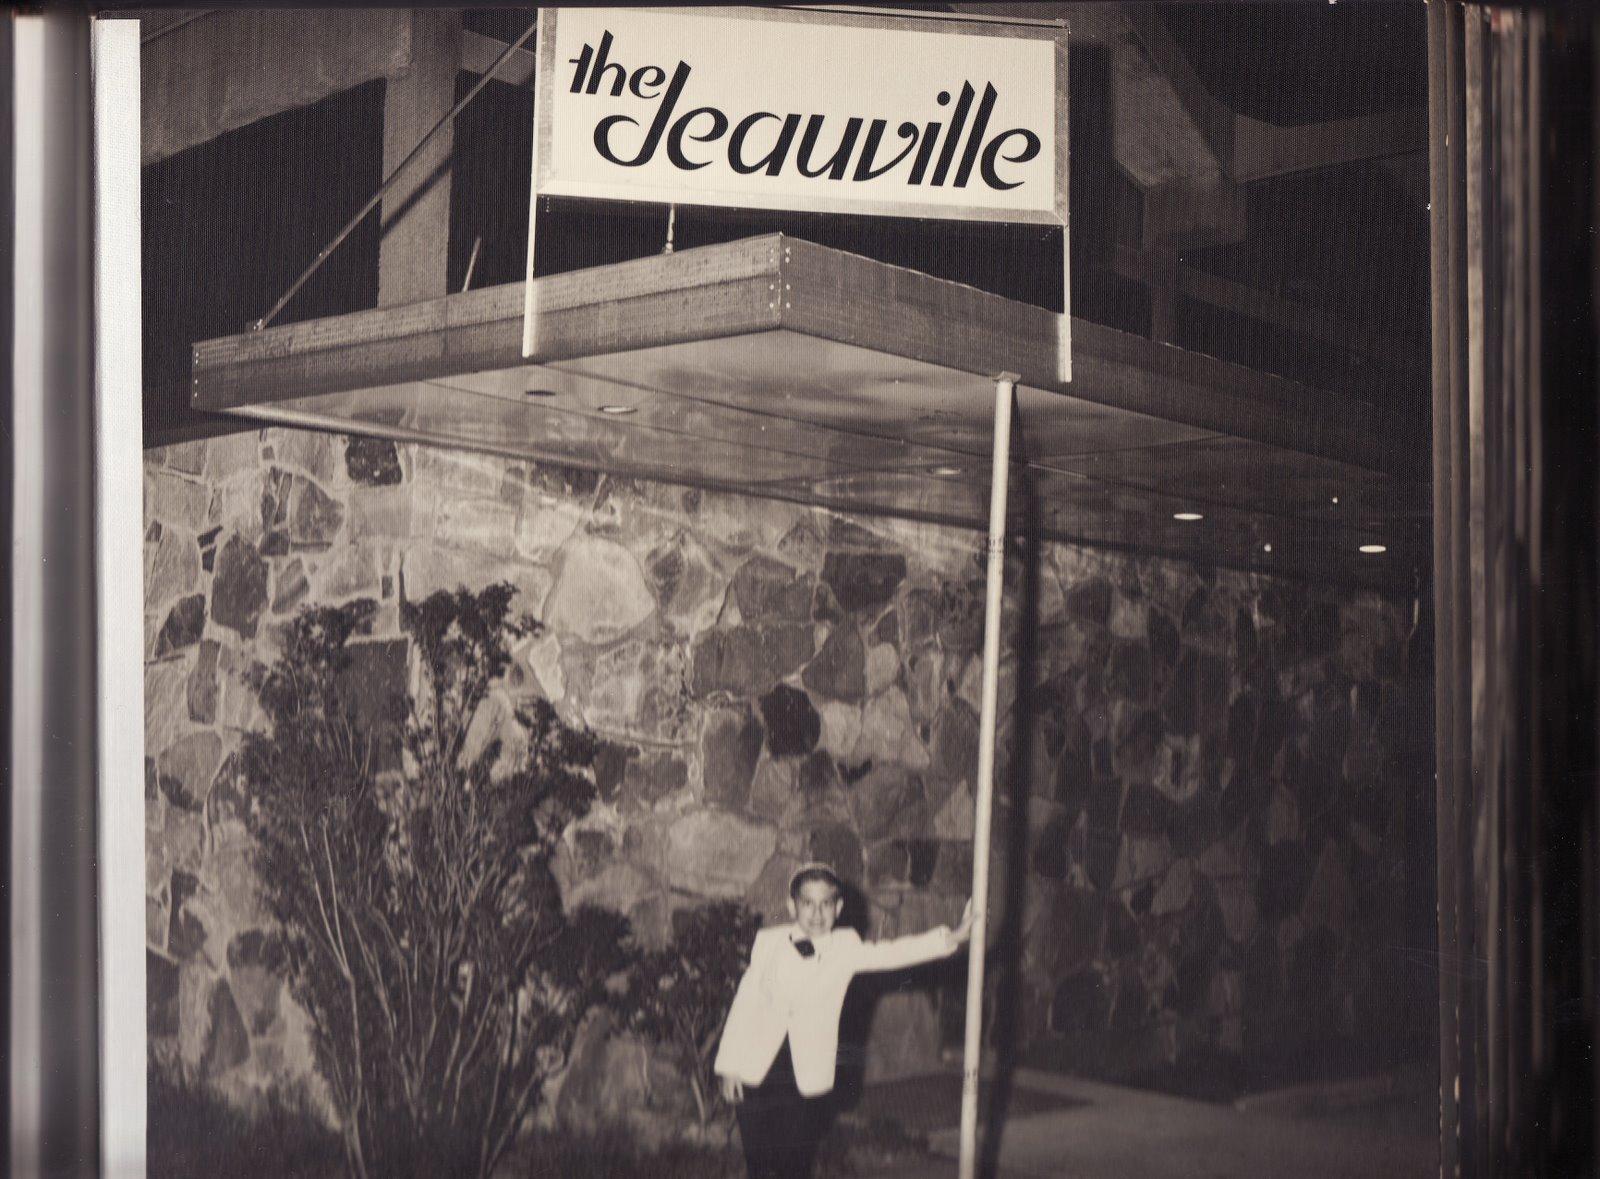 Halloween 2020 Sheepshead Ua Remember When: The UA Was the Deauville Beach Club?   BKLYNER